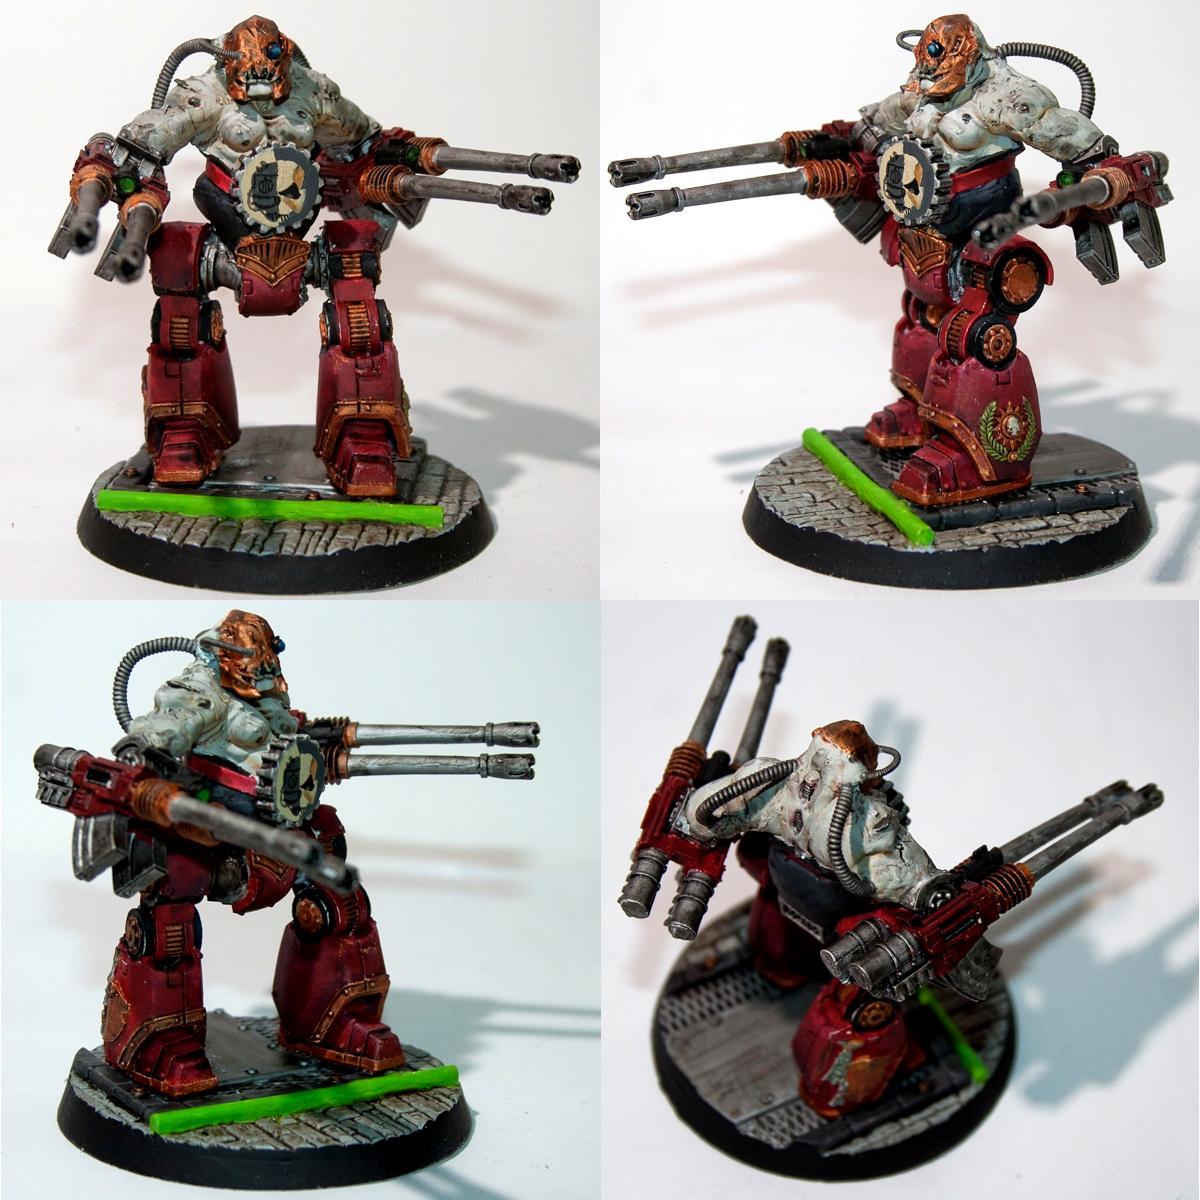 Adeptus Mechanicus, Admech, Contemptor, Conversion, Games Workshop, Ogre Bits, Ogres, Space Marine Bits, Warhammer 40,000